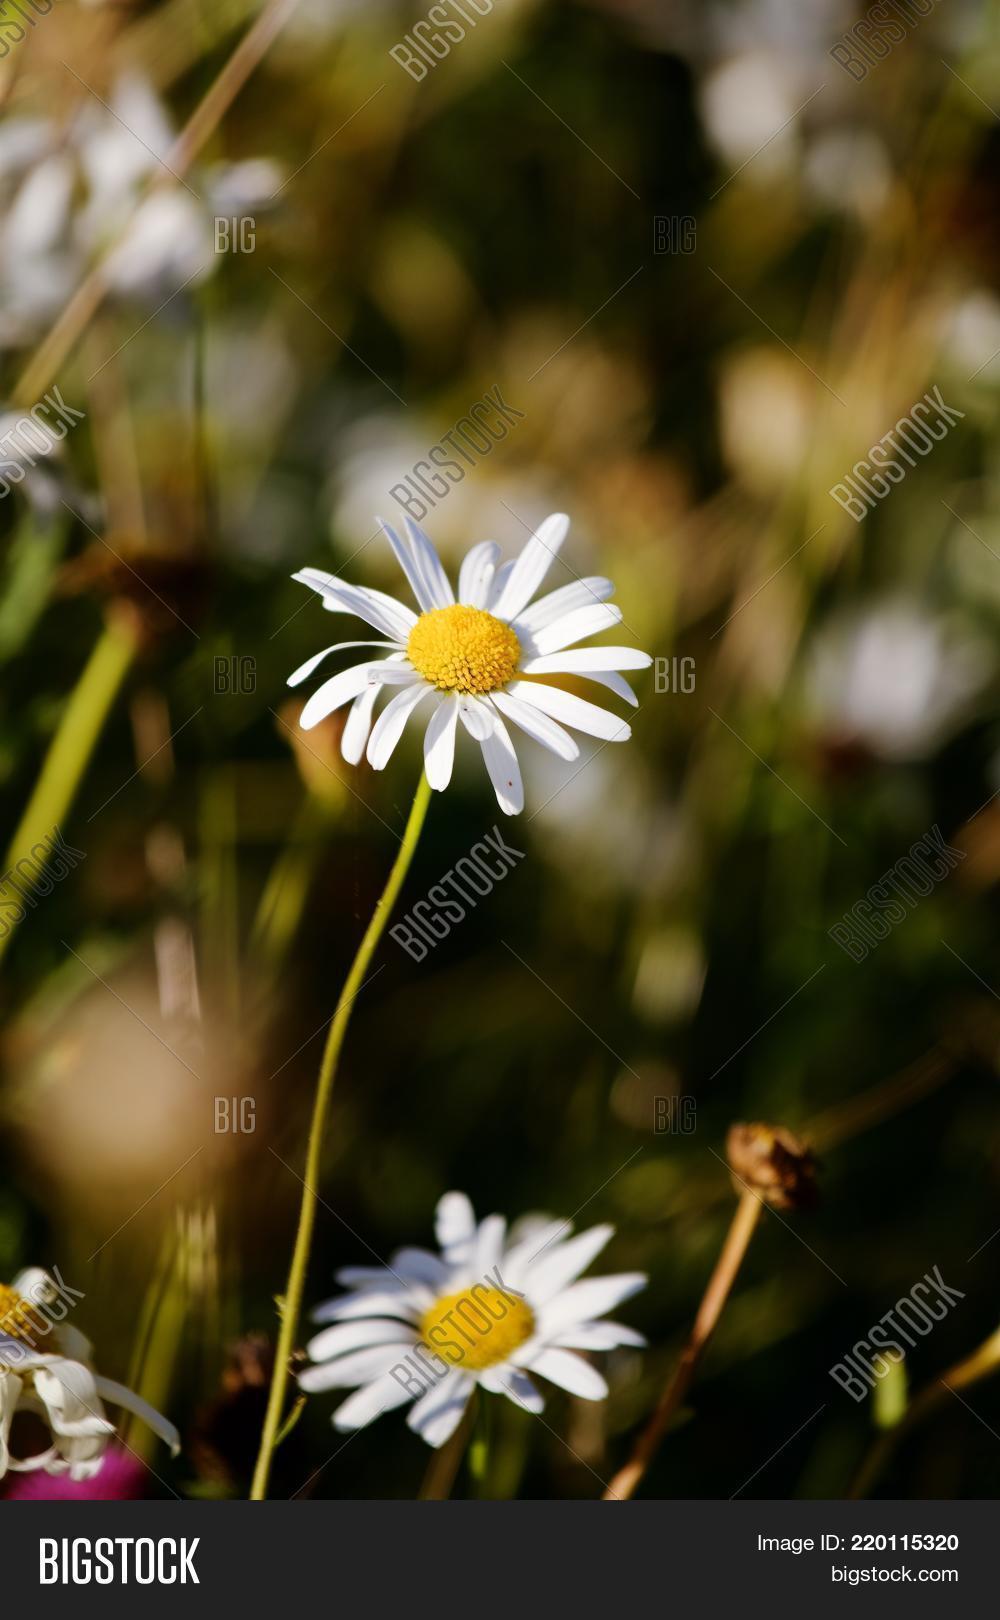 Wild daisy wild flower image photo free trial bigstock wild daisy in wild flower meadow bright white and yellow izmirmasajfo